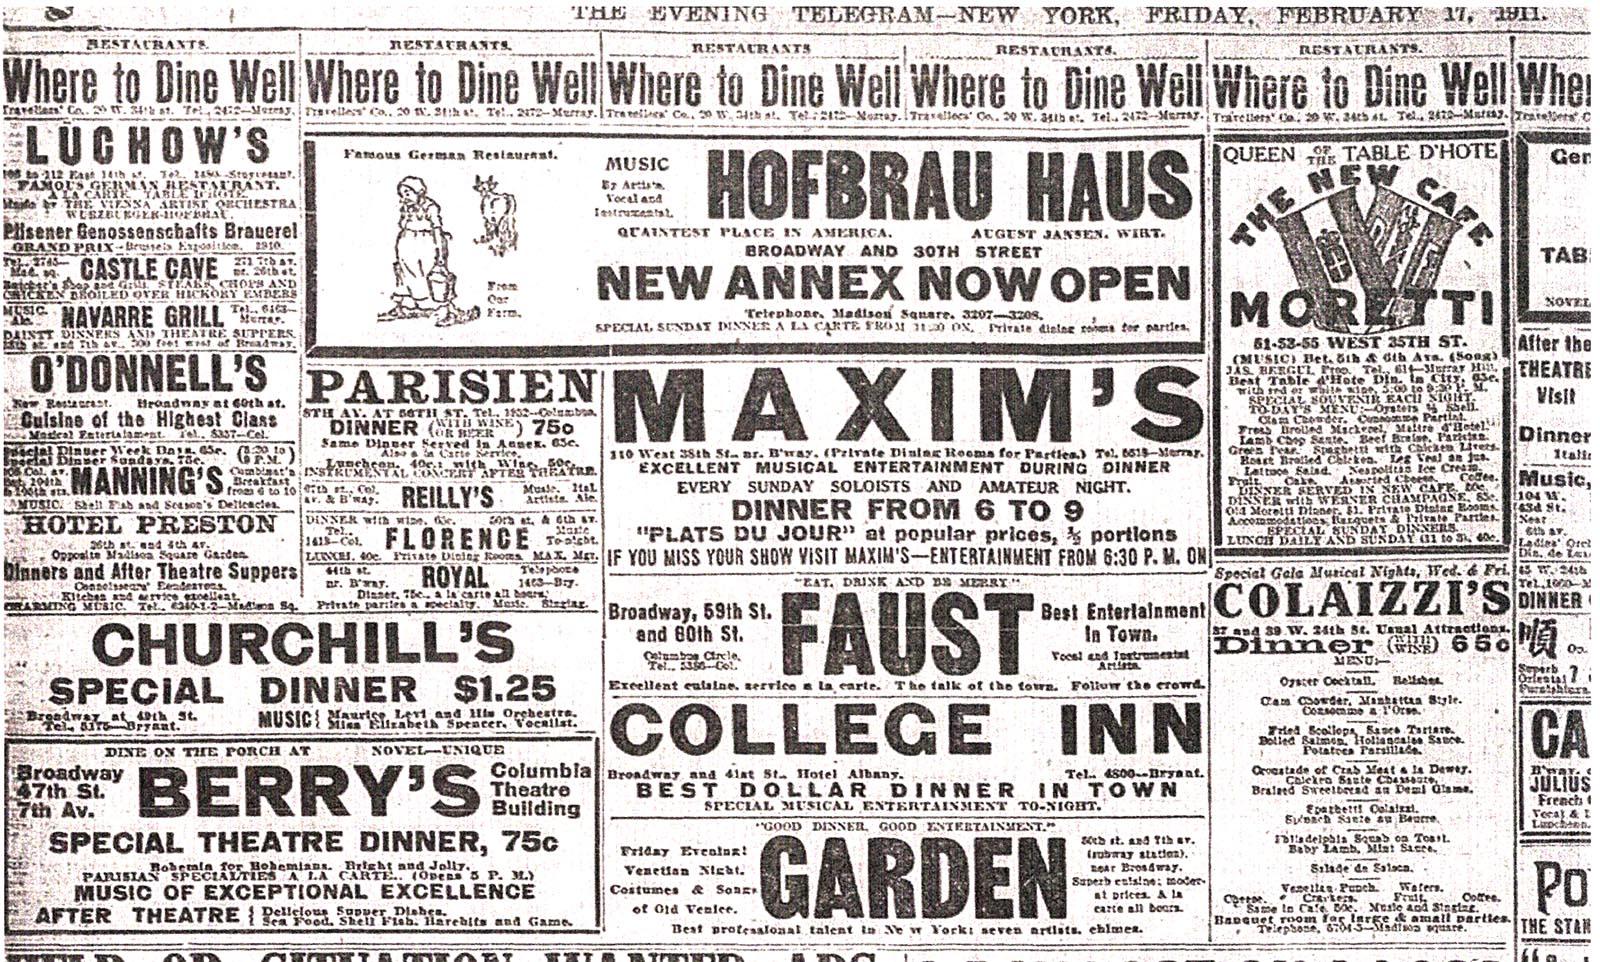 Paper advertising